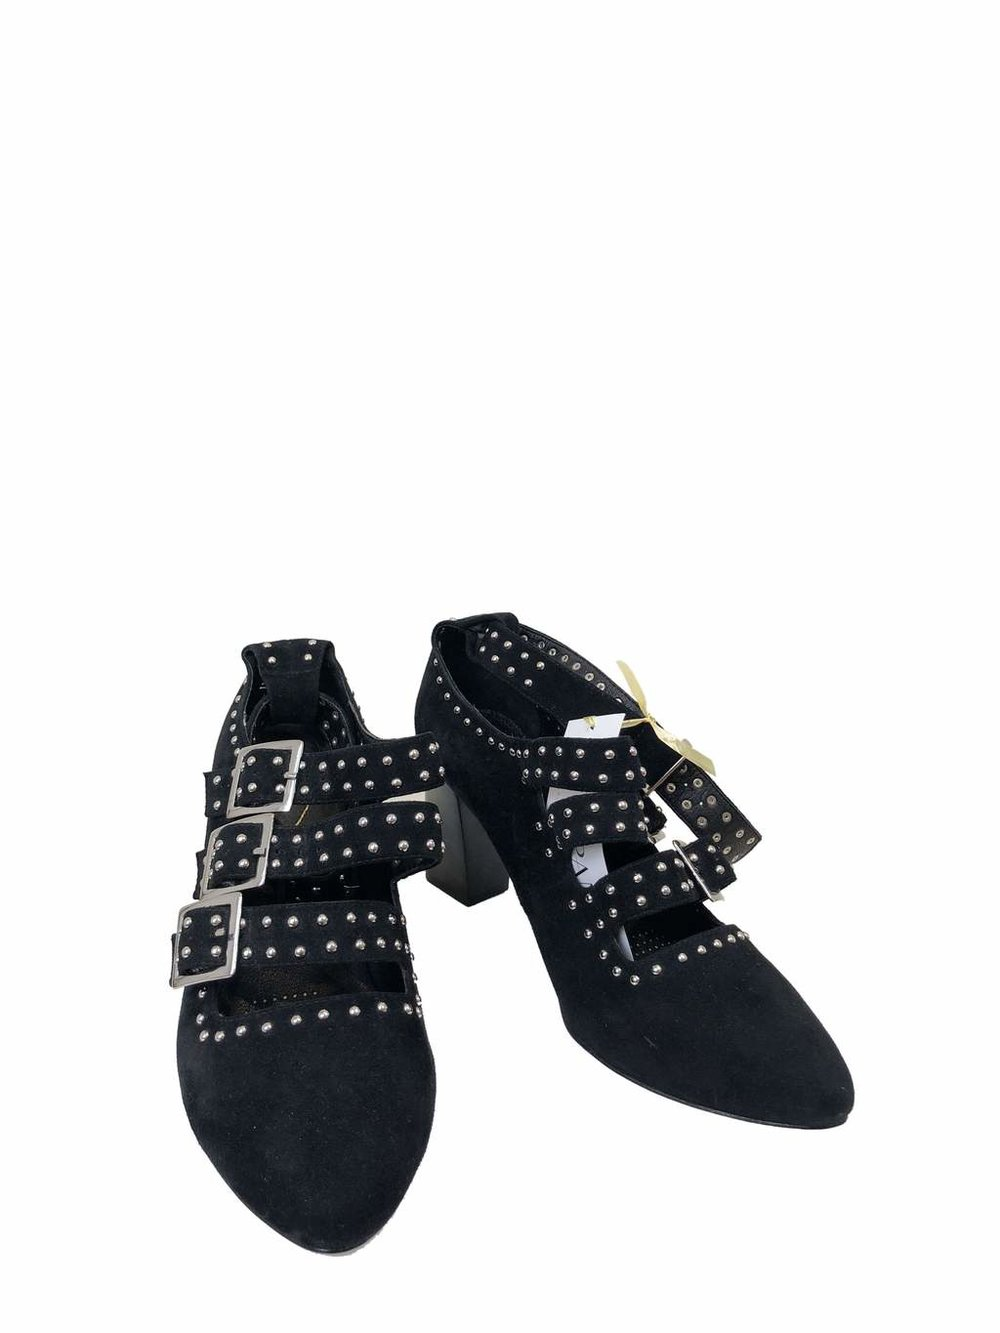 Sargossa black studded heels at timpanys